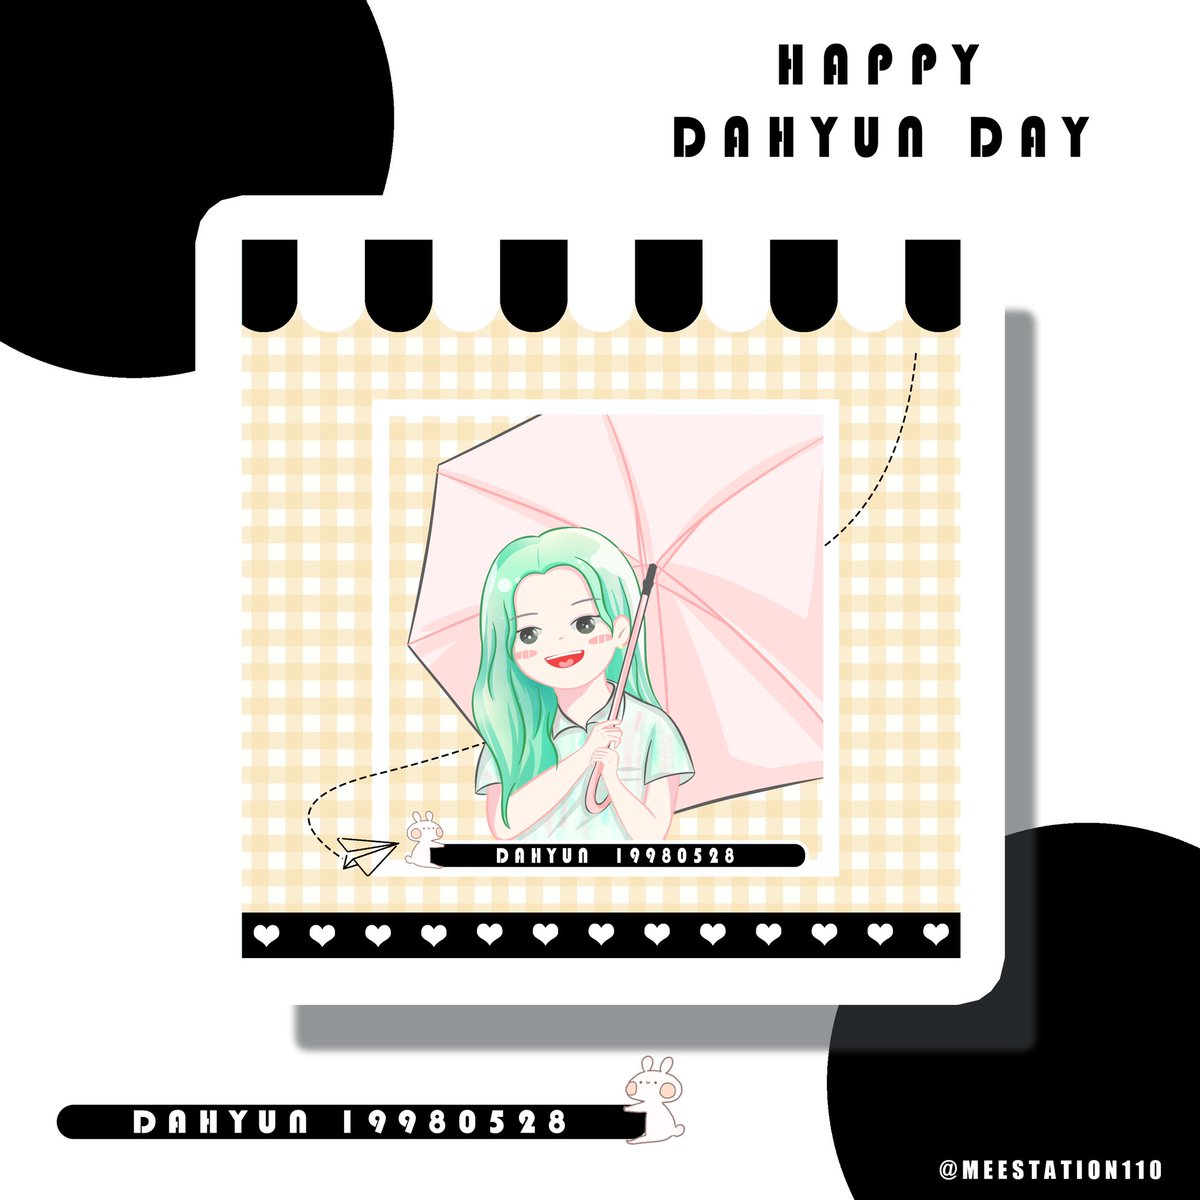 HAPPY DAHYUN DAY🎂 #트와이스 #TWICE #다현 #DAHYUN #ダヒョン #HappyDAHYUNday #OurShiningLightDahyun #5월의_끝에서_만난_다현이